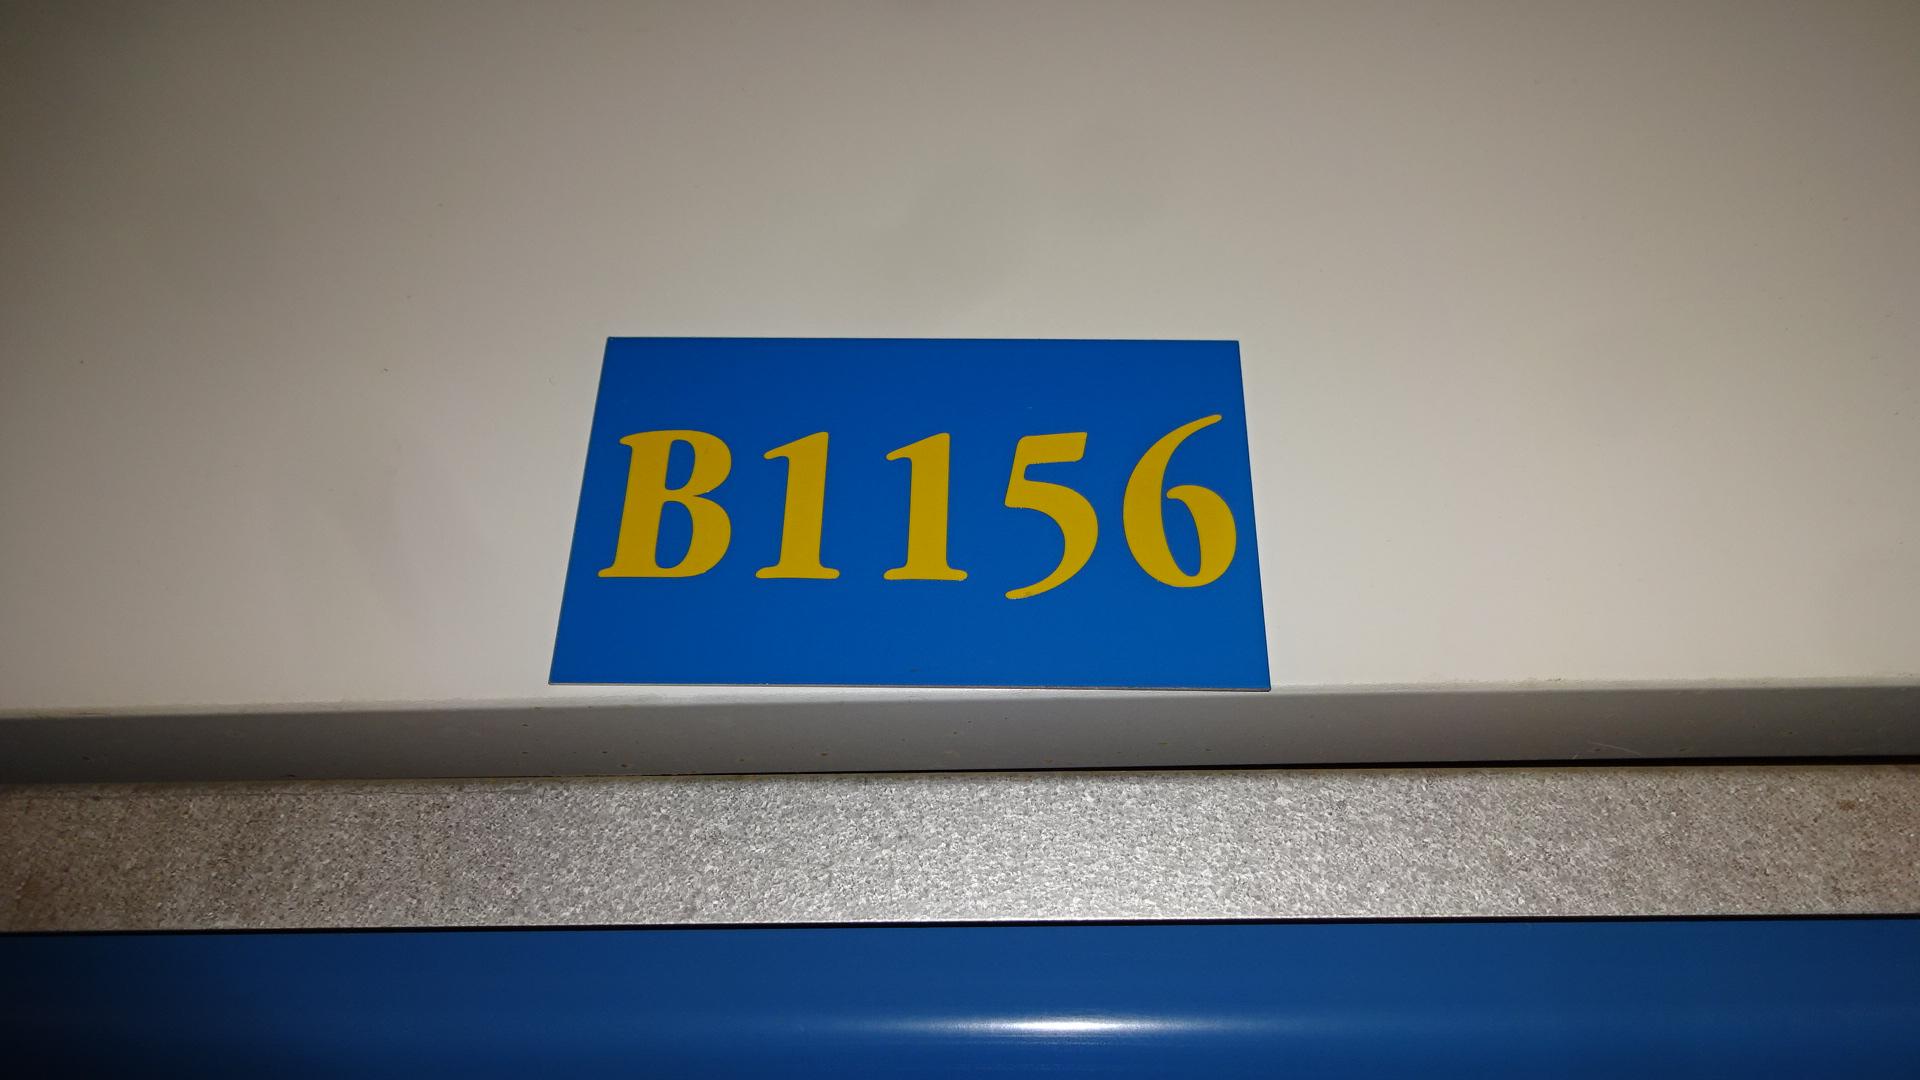 Unit B1156 Bid13